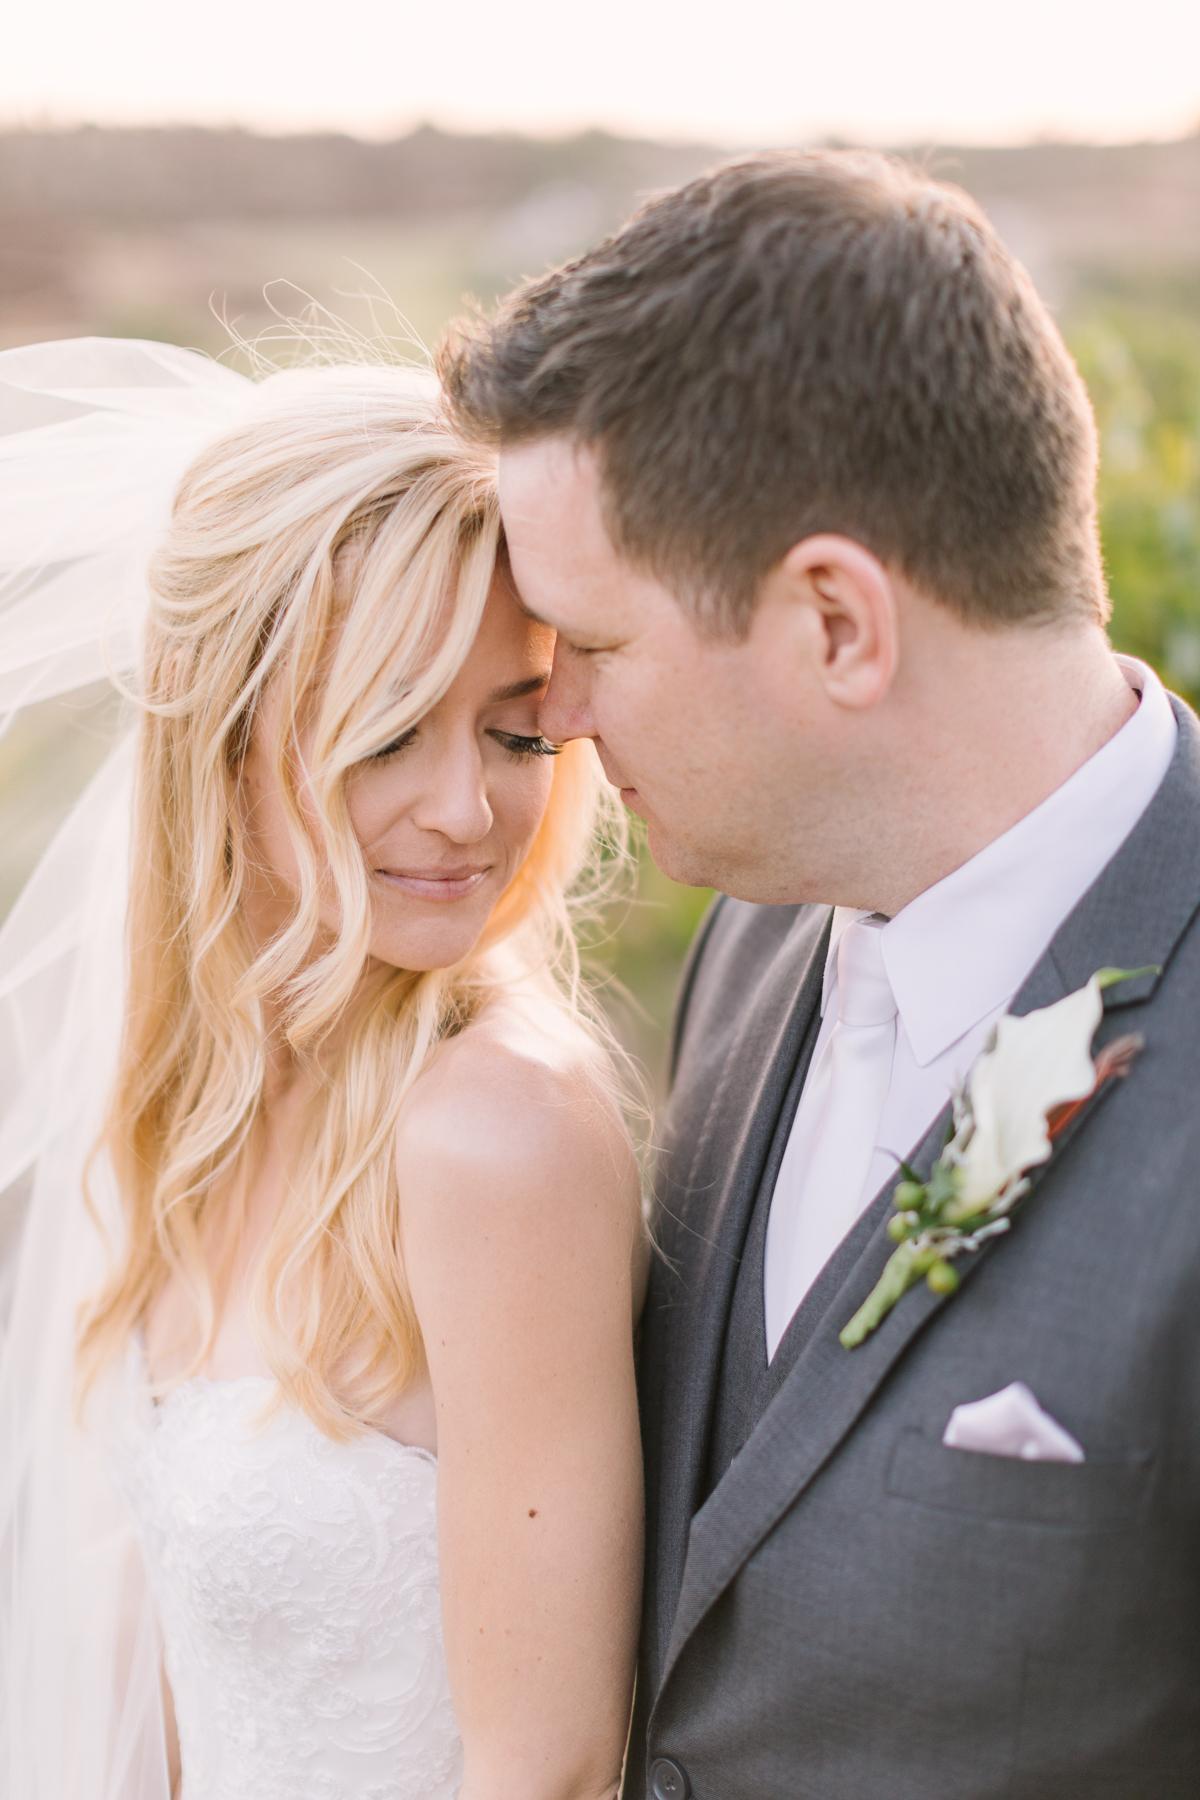 Orange-County-Wedding-Photography-Brianna-Caster-and-Co-Photographers-Falkner-Winery-Wedding-11